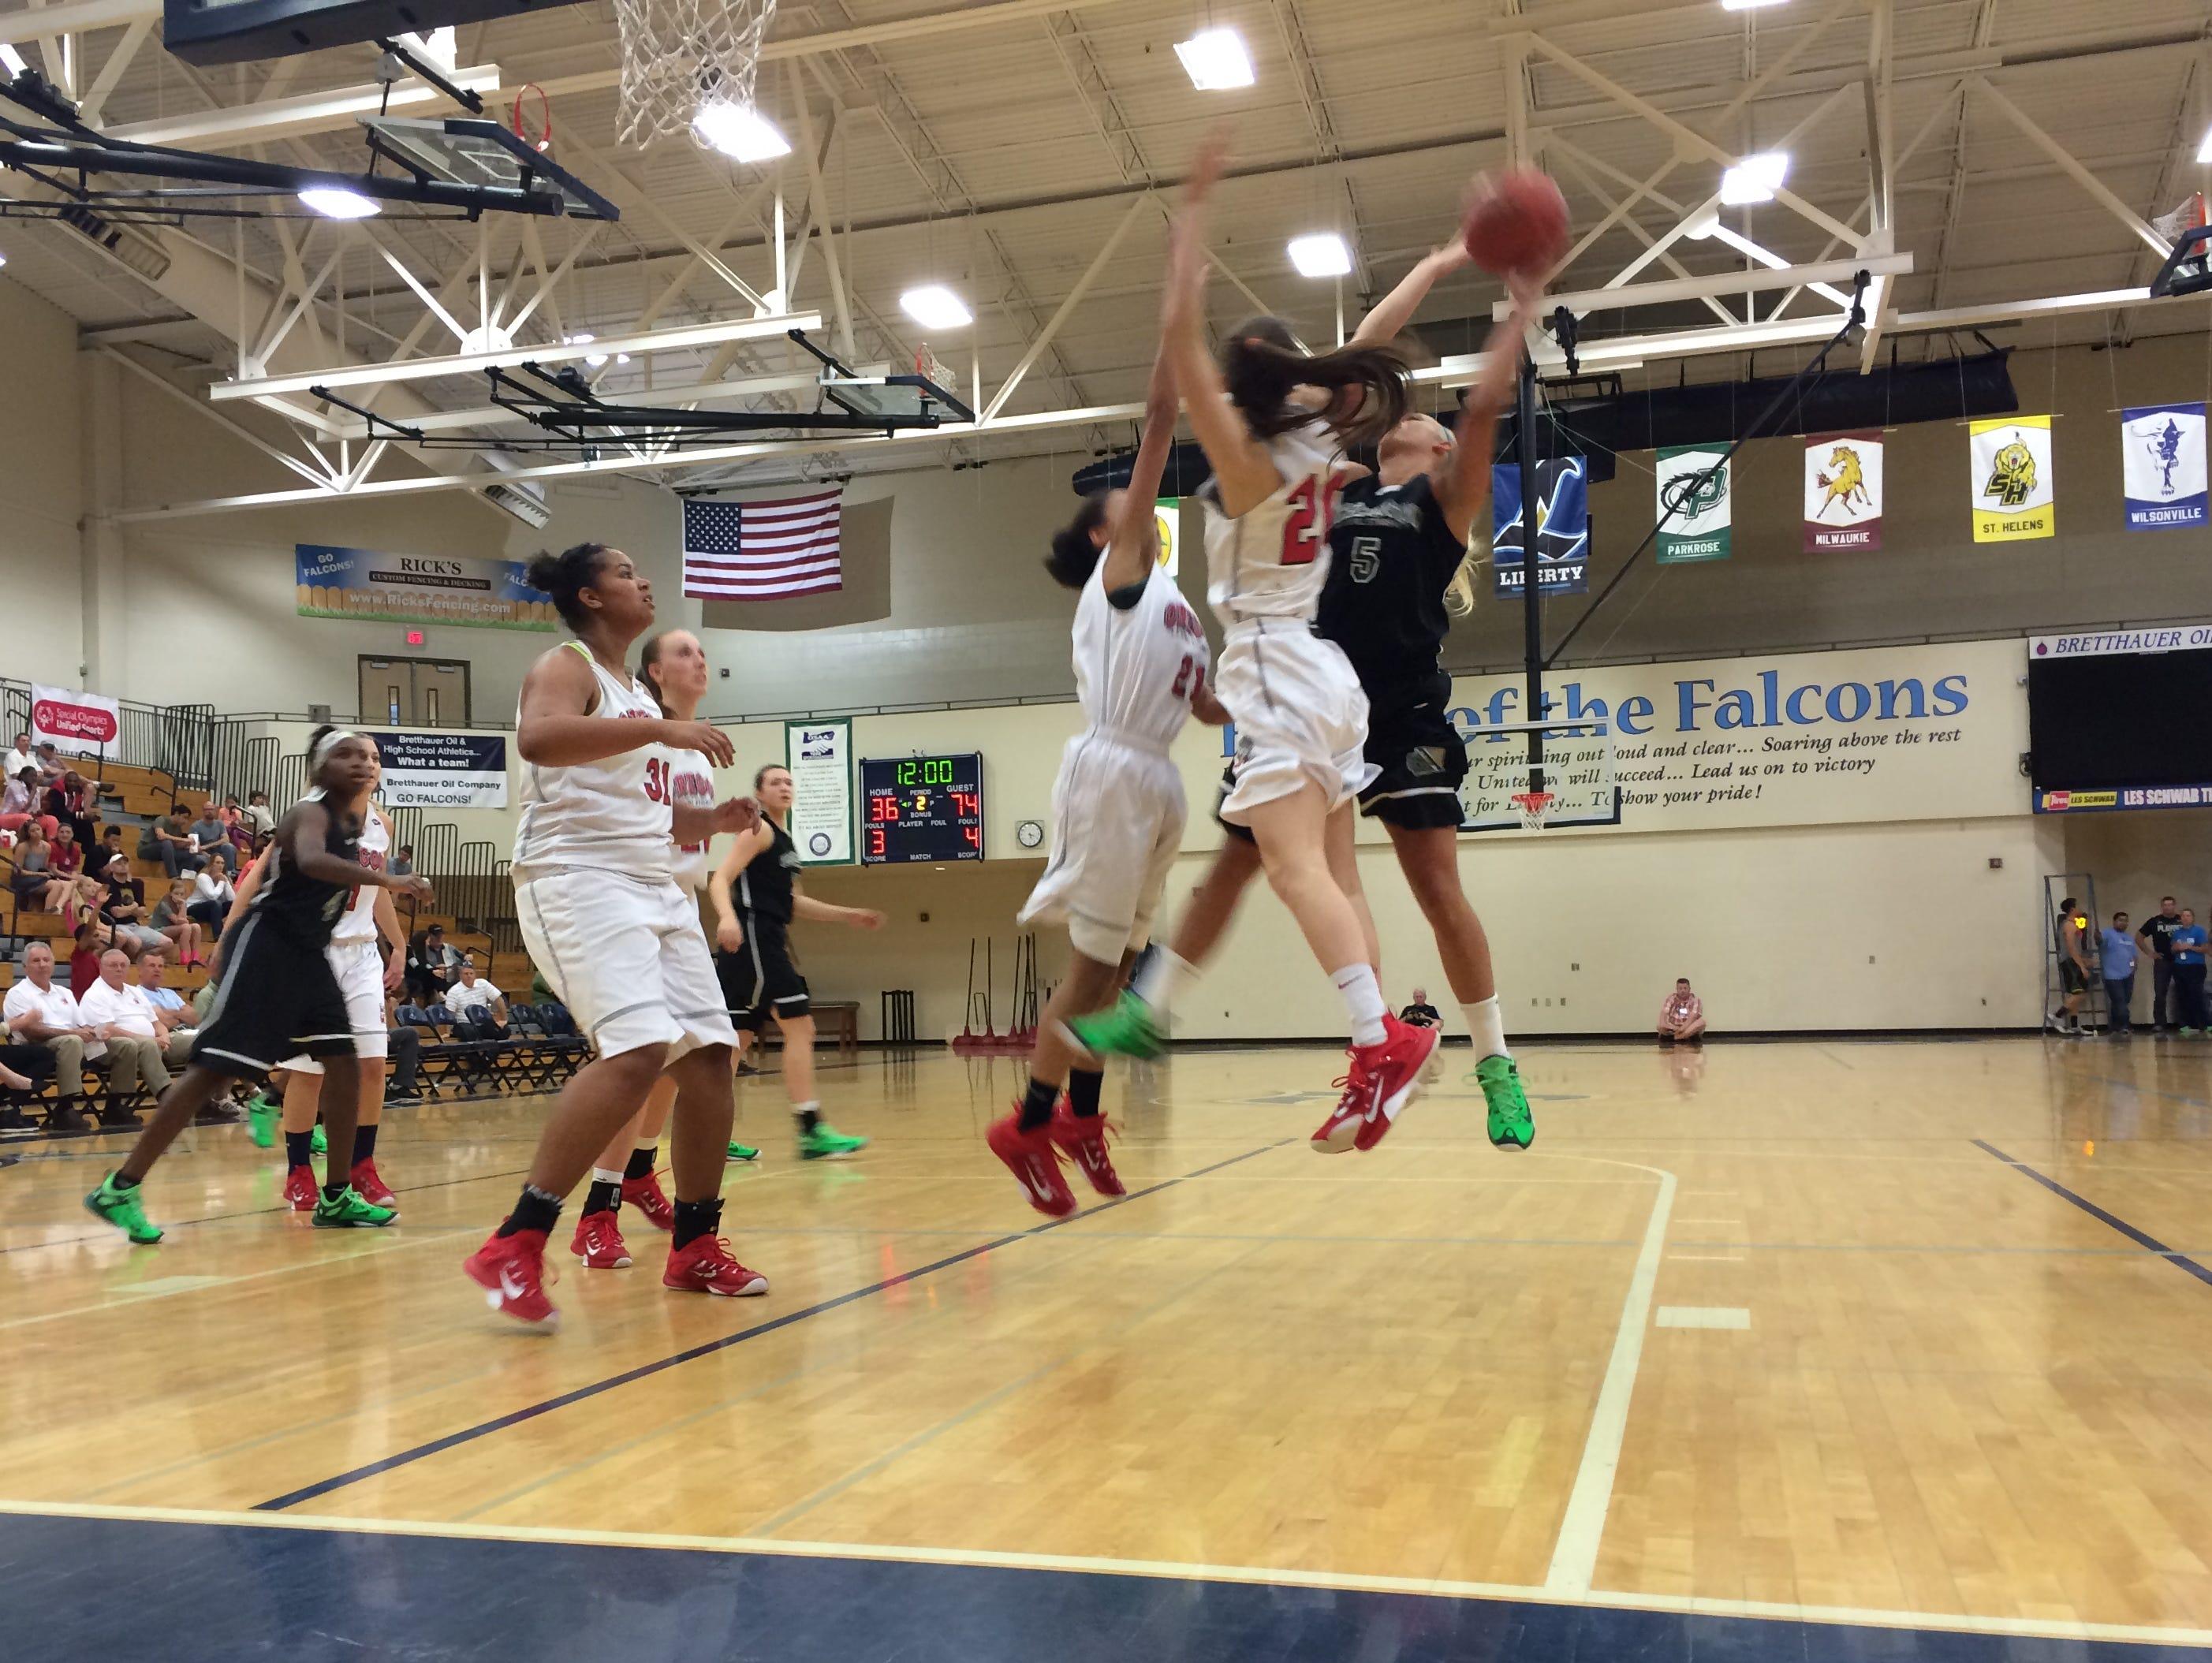 Washington's Madison Hovren's shot is contested by Oregon's Nohea Waiwaiole.